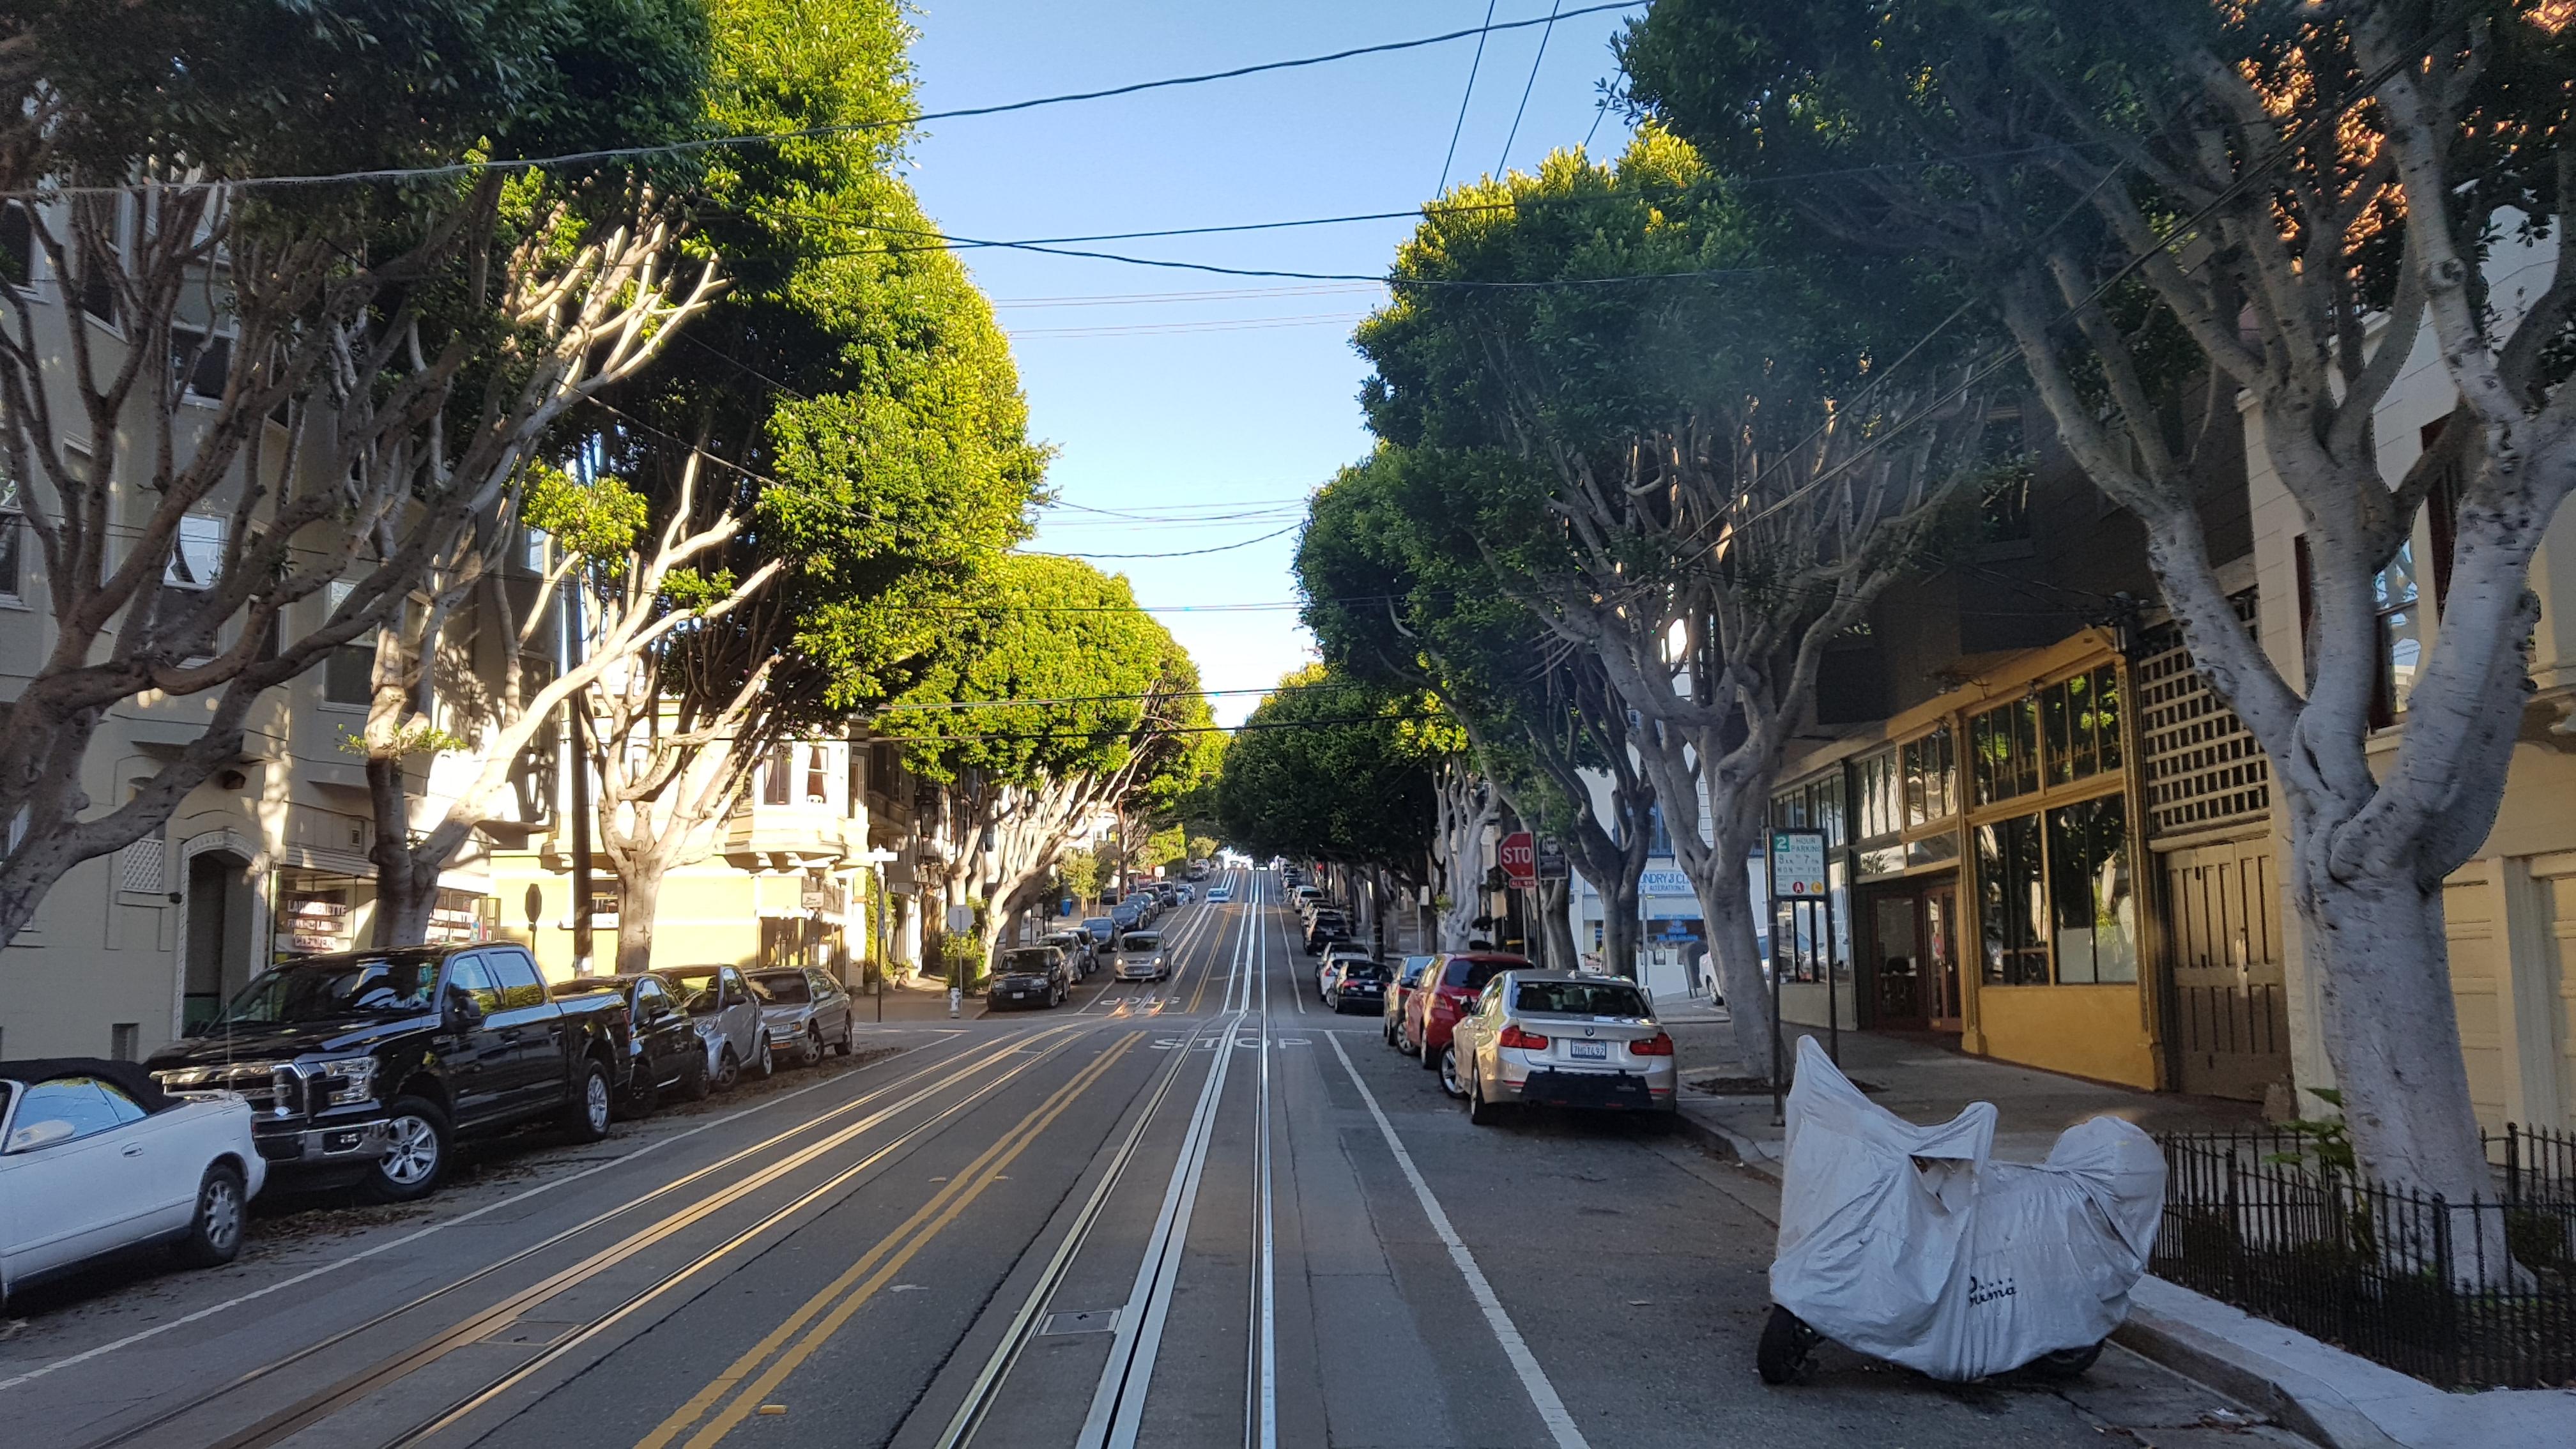 cable car, cable car turnaround point, fisher man's wharf, Golden Gate Bridge, Hyde, Powell, powell st, uber, [샌프란시스코] 케이블카 ( Cable Car ) 이야기, 관광객, 교통 패스, 금문교, 기름냄새, 땅속 케이블, 레일, 명물, 발판, 불법, 불법 승차, 샌프란, 샌프란 명물, 샌프란시스코, 신호등, 아날로그 감성, 열차, 우버, 원리, 조작부, 지형, 추천 코스, 케이블카, 케이블카 턴어라운드 포인트, 티켓 가격, 편도 가격, 풍광